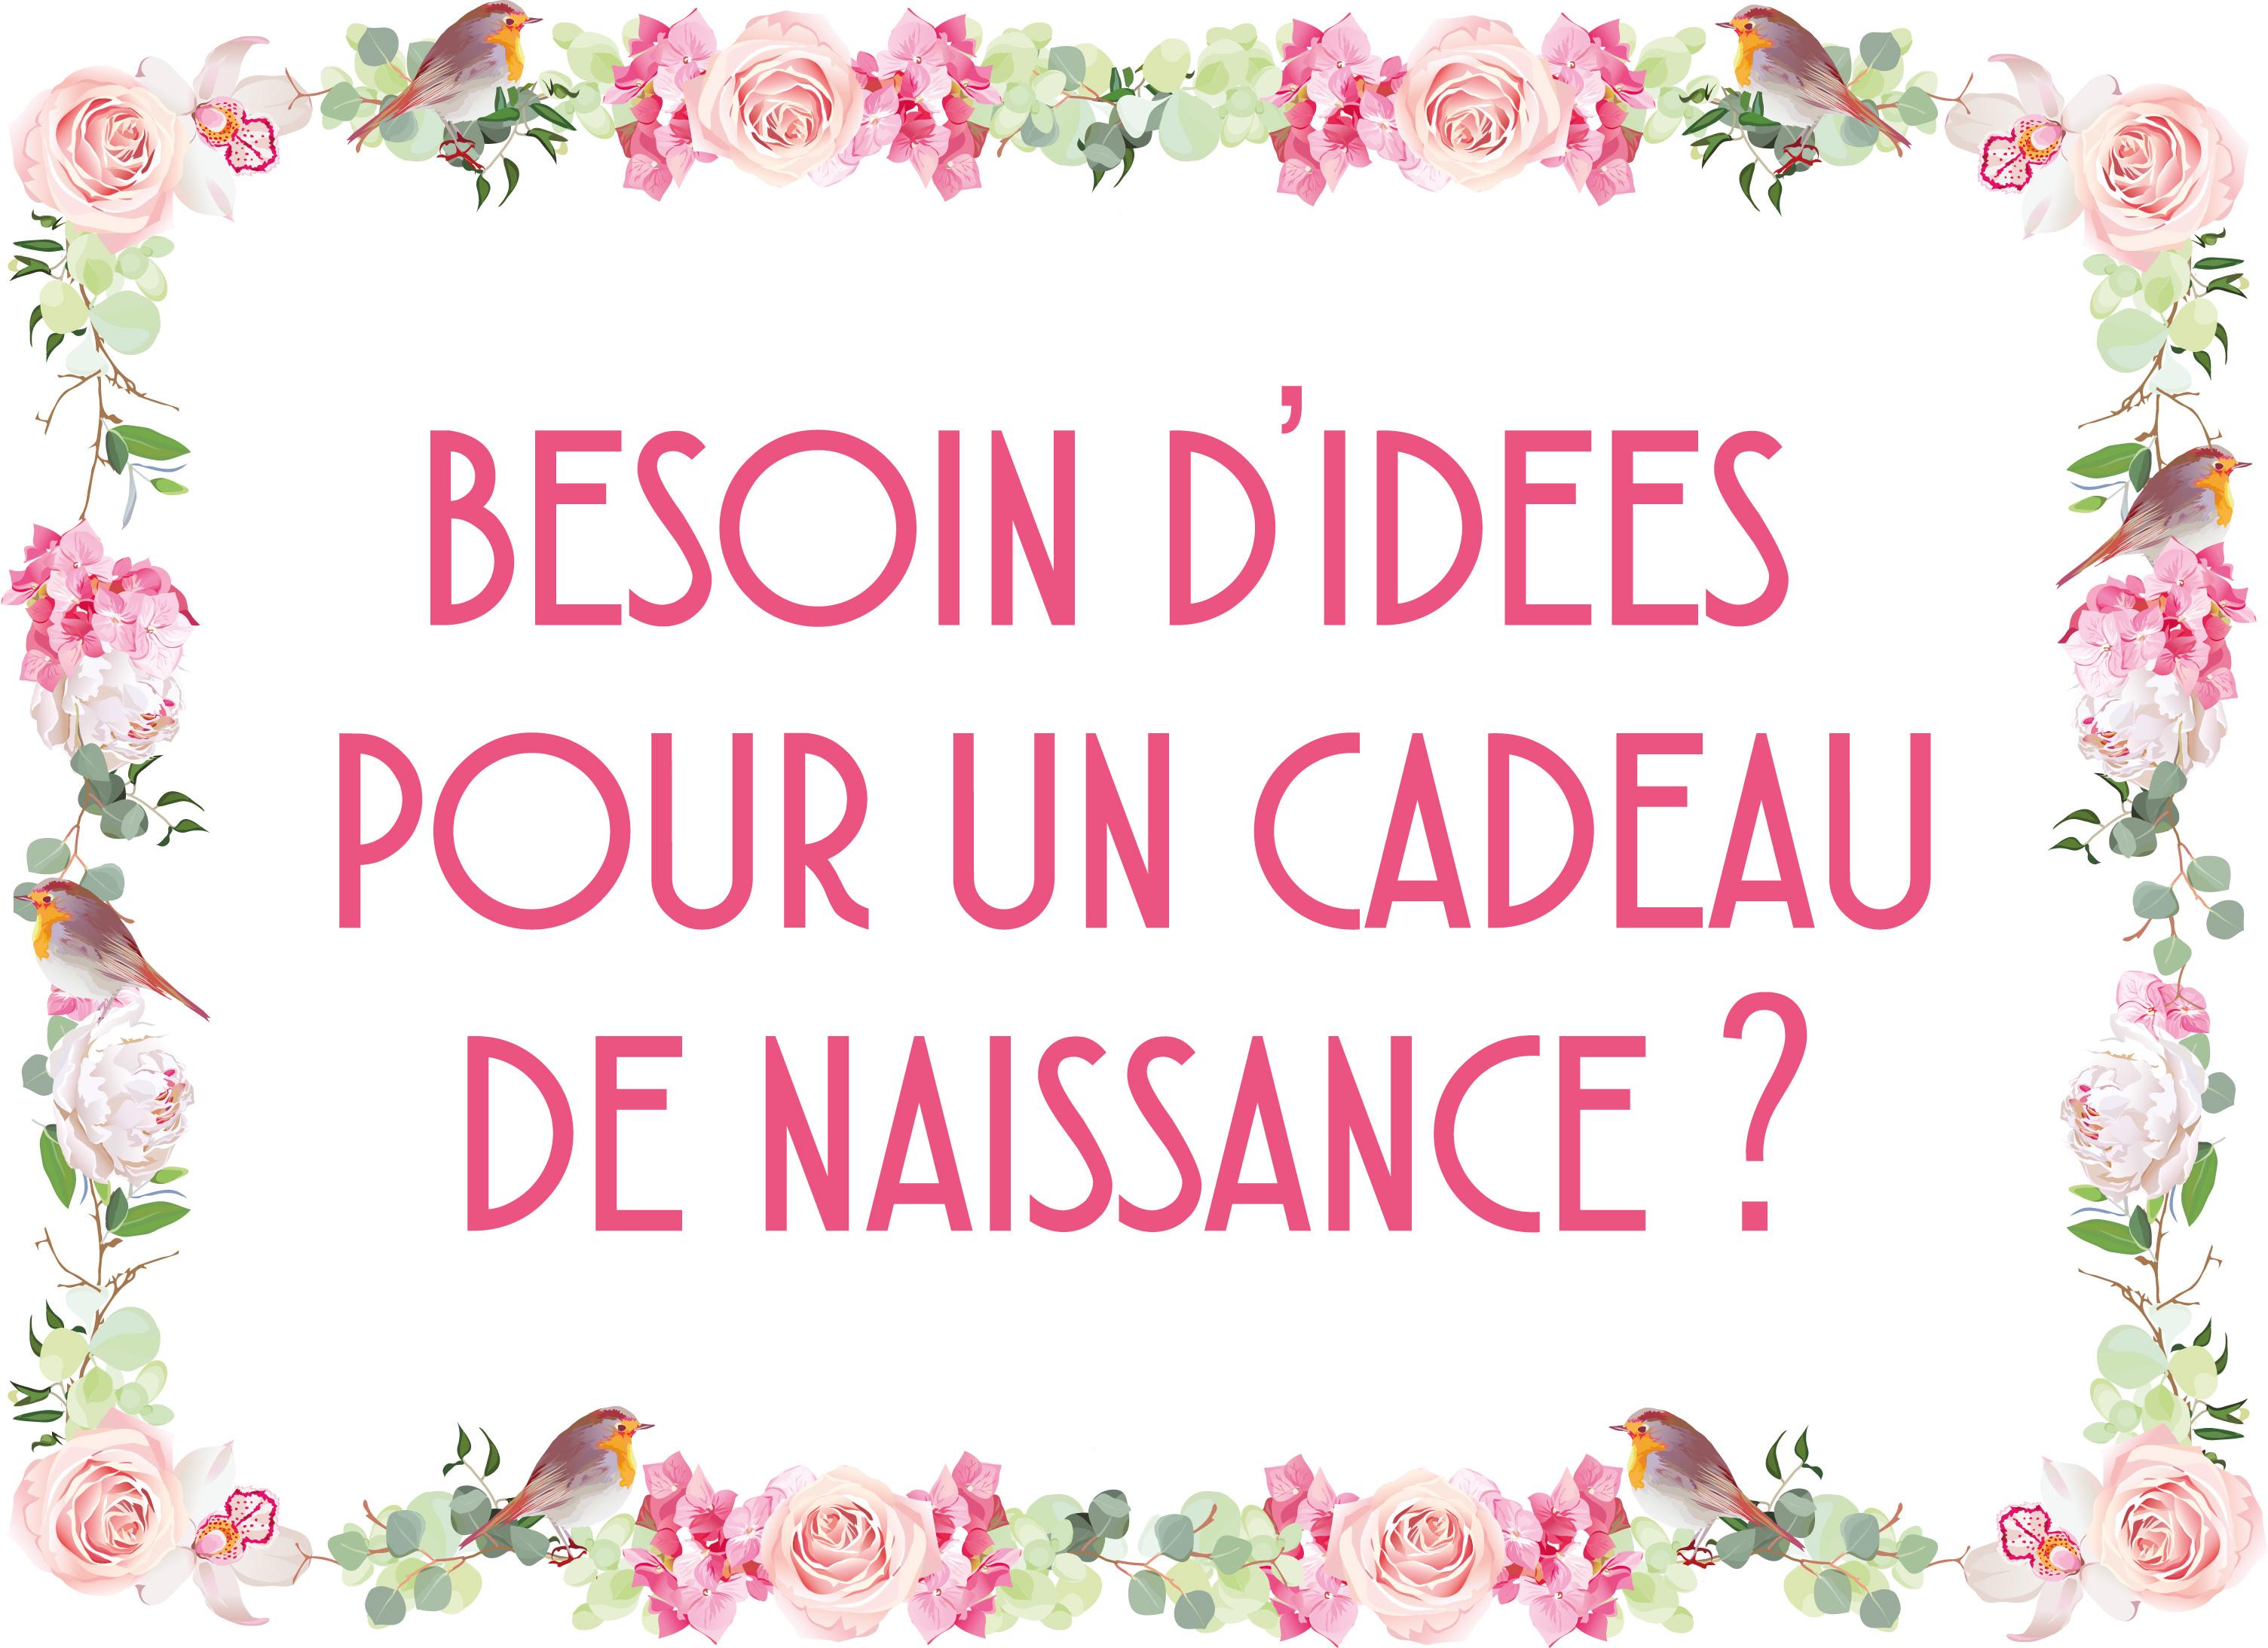 Naissance by Matao